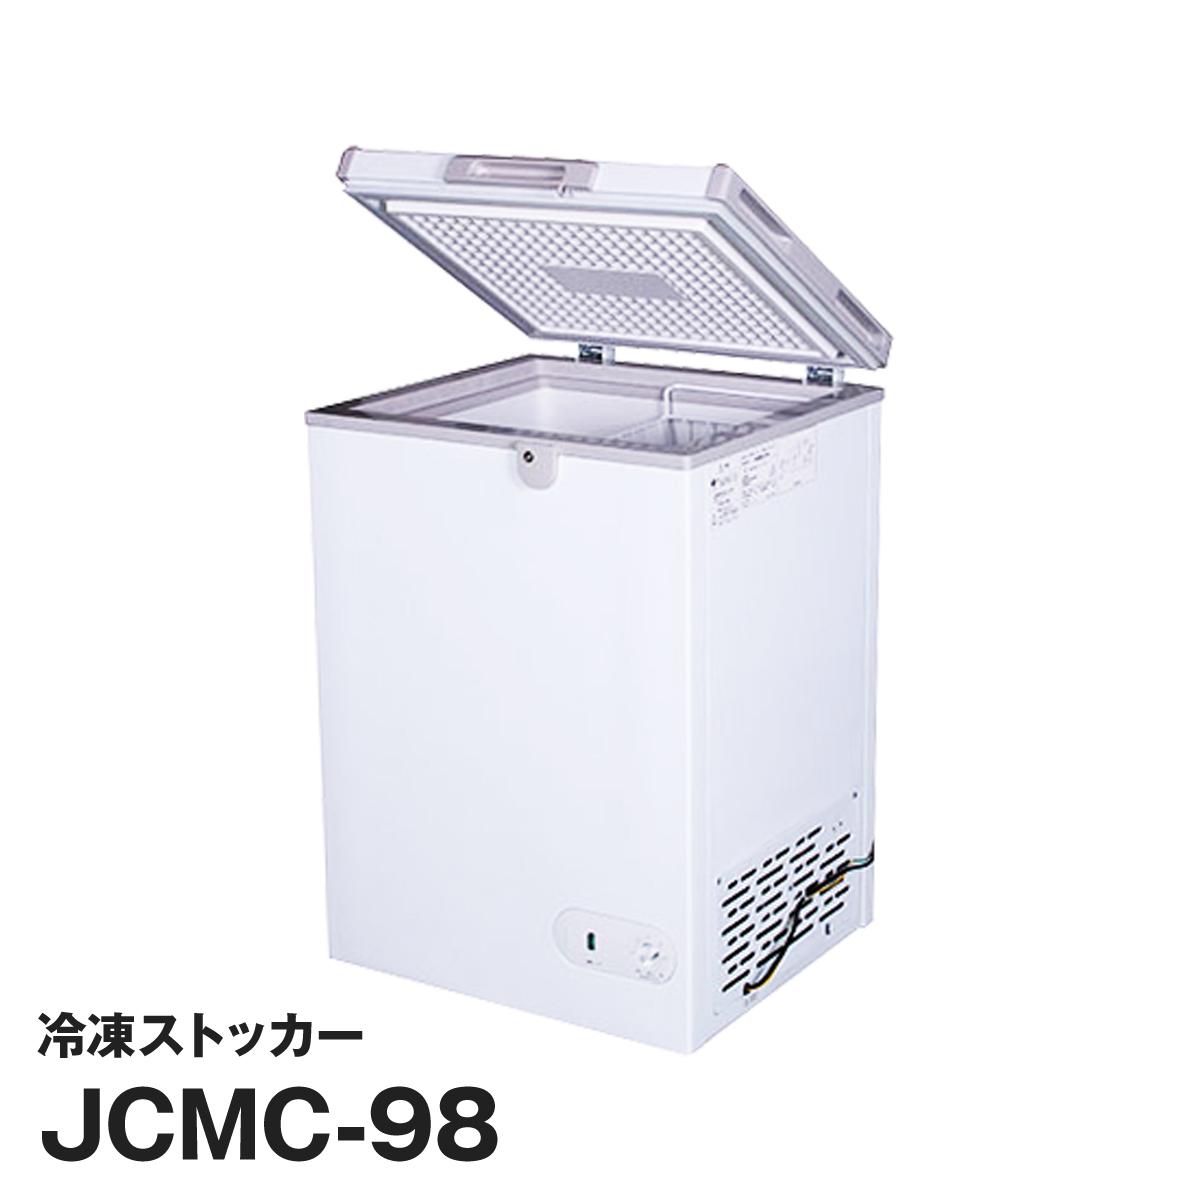 JCM社製 業務用 保冷庫 冷凍庫 98L 冷凍ストッカー JCMC-98 新品